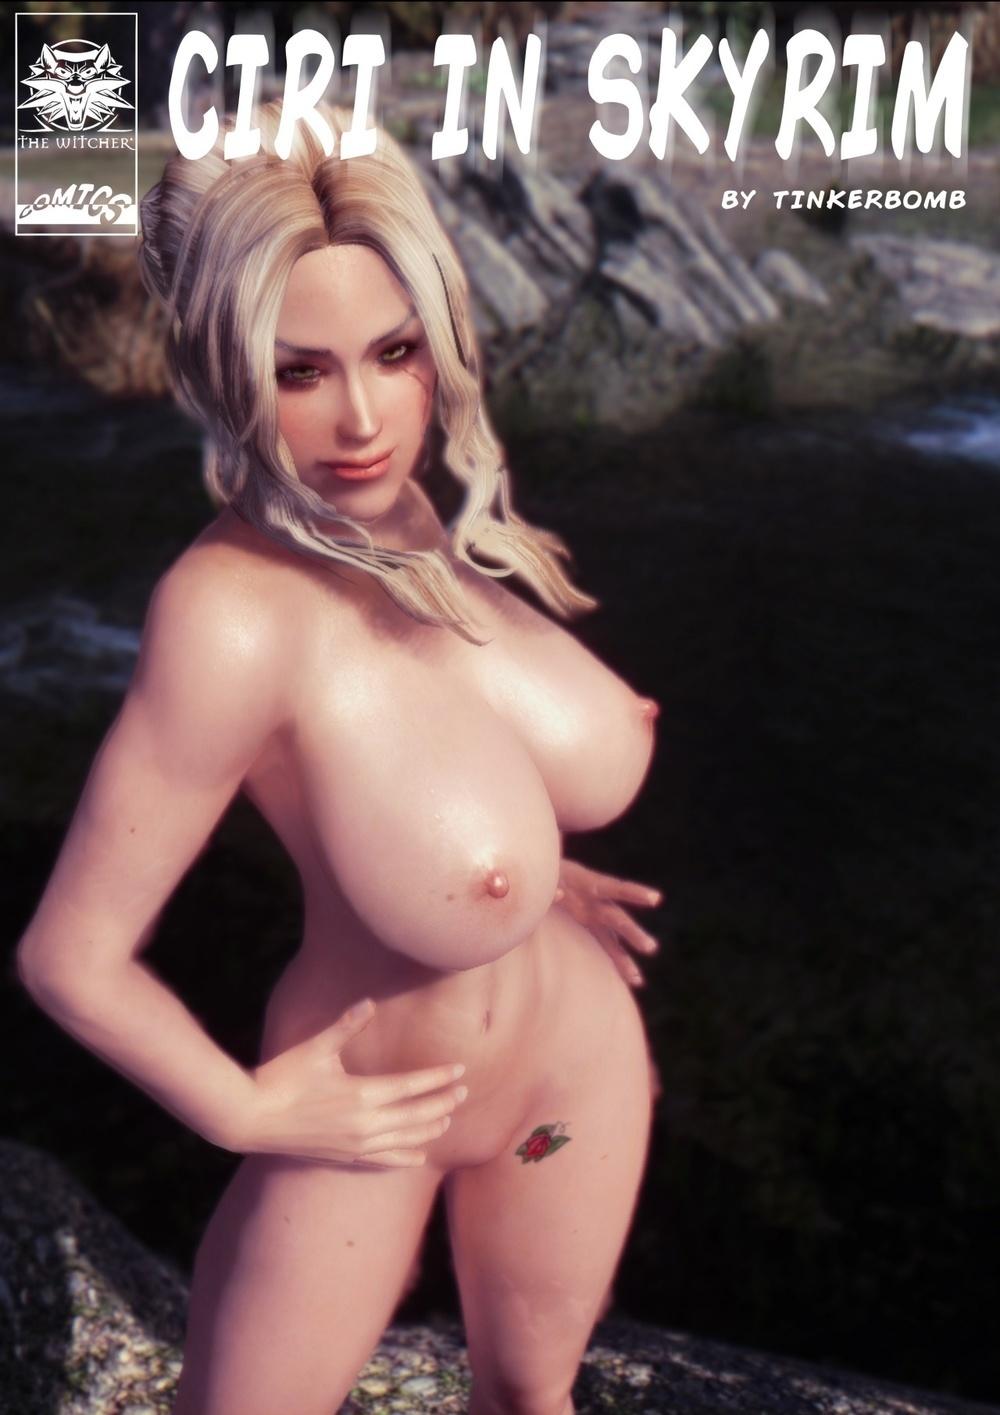 Tinkerbomb – Ciri in Skyrim (8 Pics)